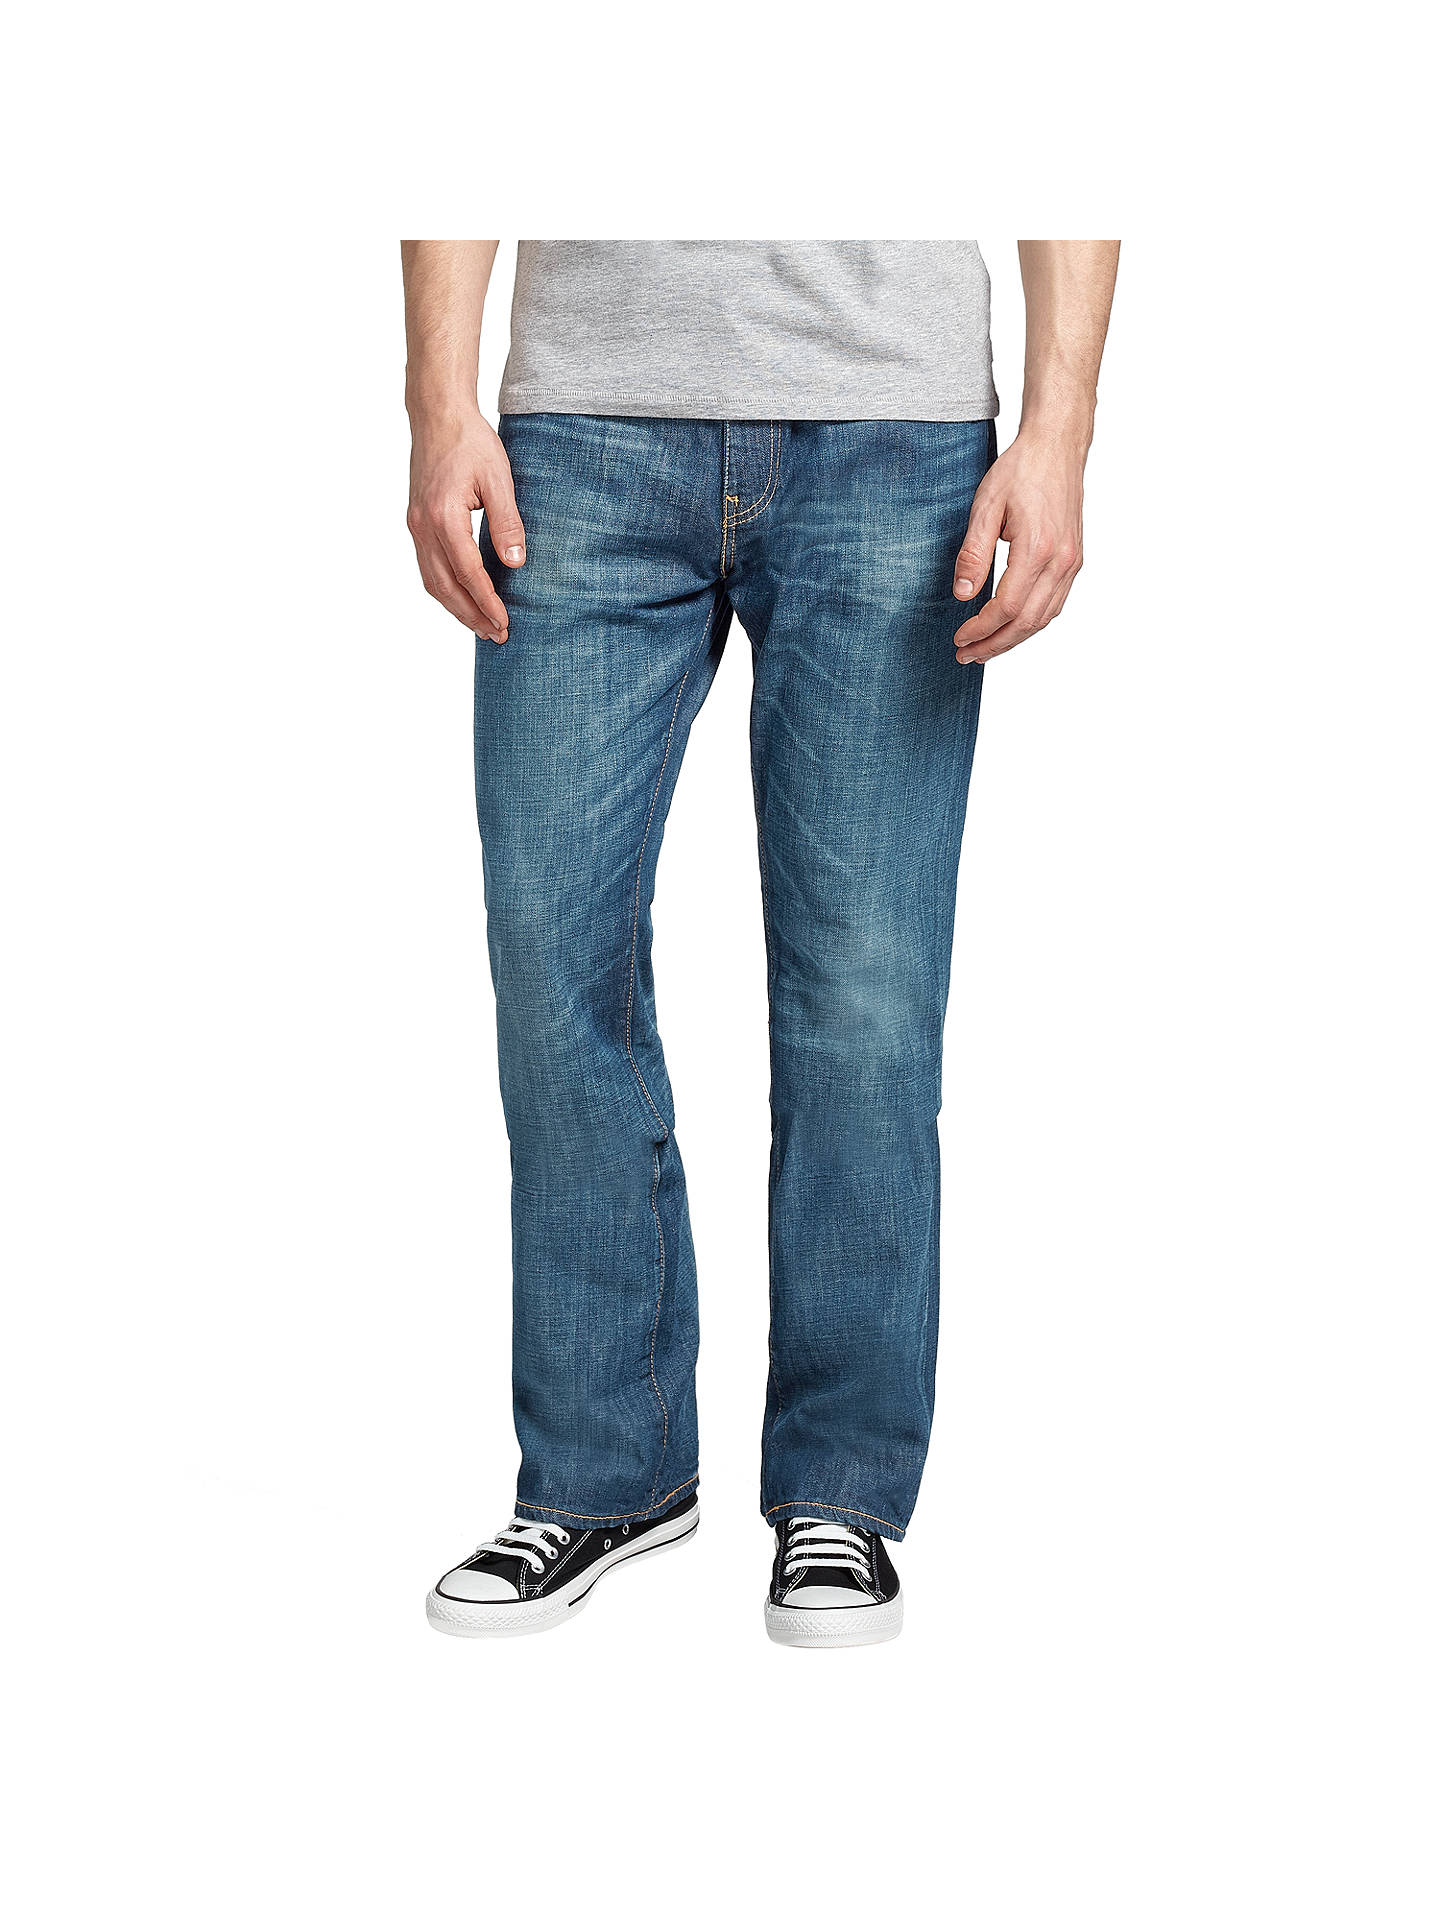 ec2f11f2e01 Buy Levi's 527 Bootcut Jeans, Explorer, 30S Online at johnlewis. ...